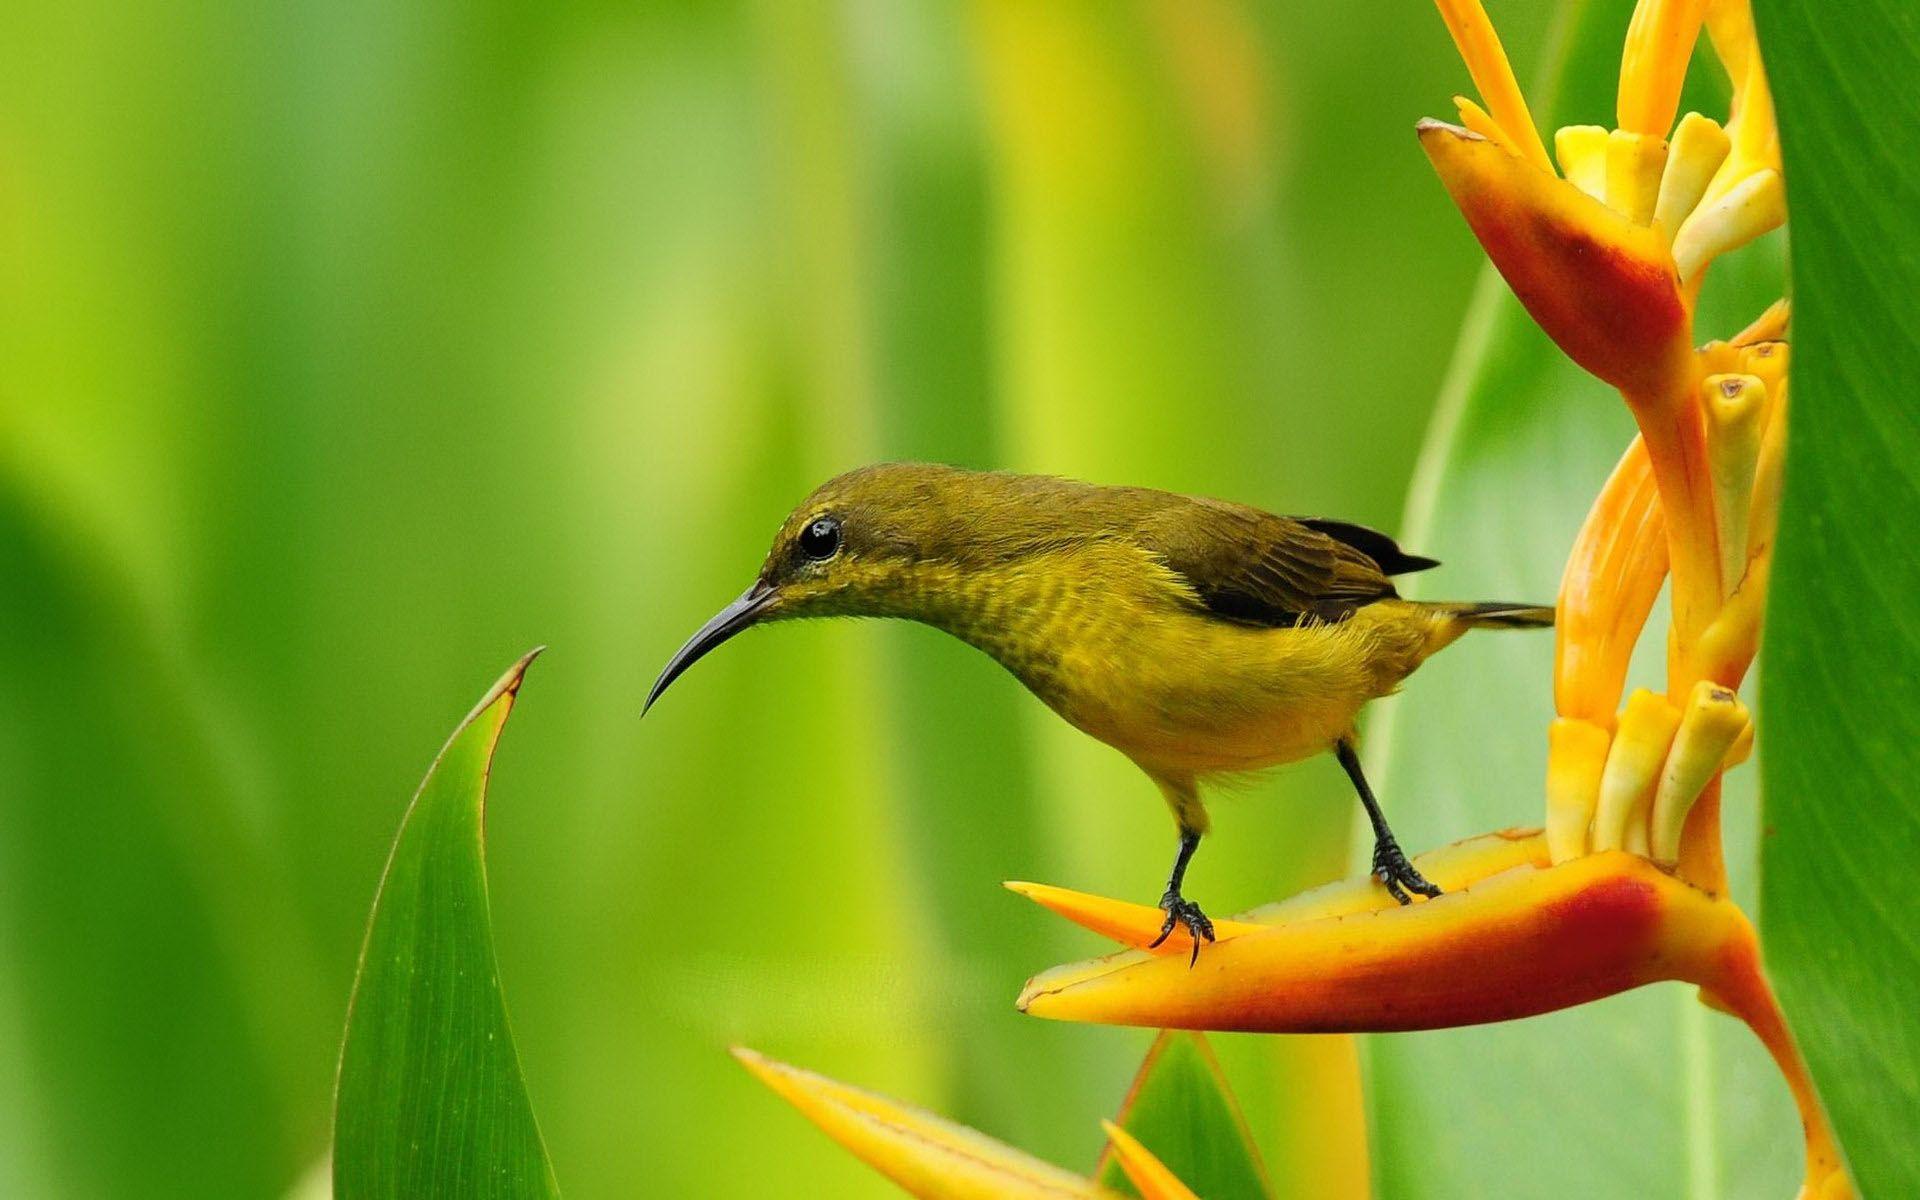 HD wallpaper download Sparrow Bird Nature Desktop HD